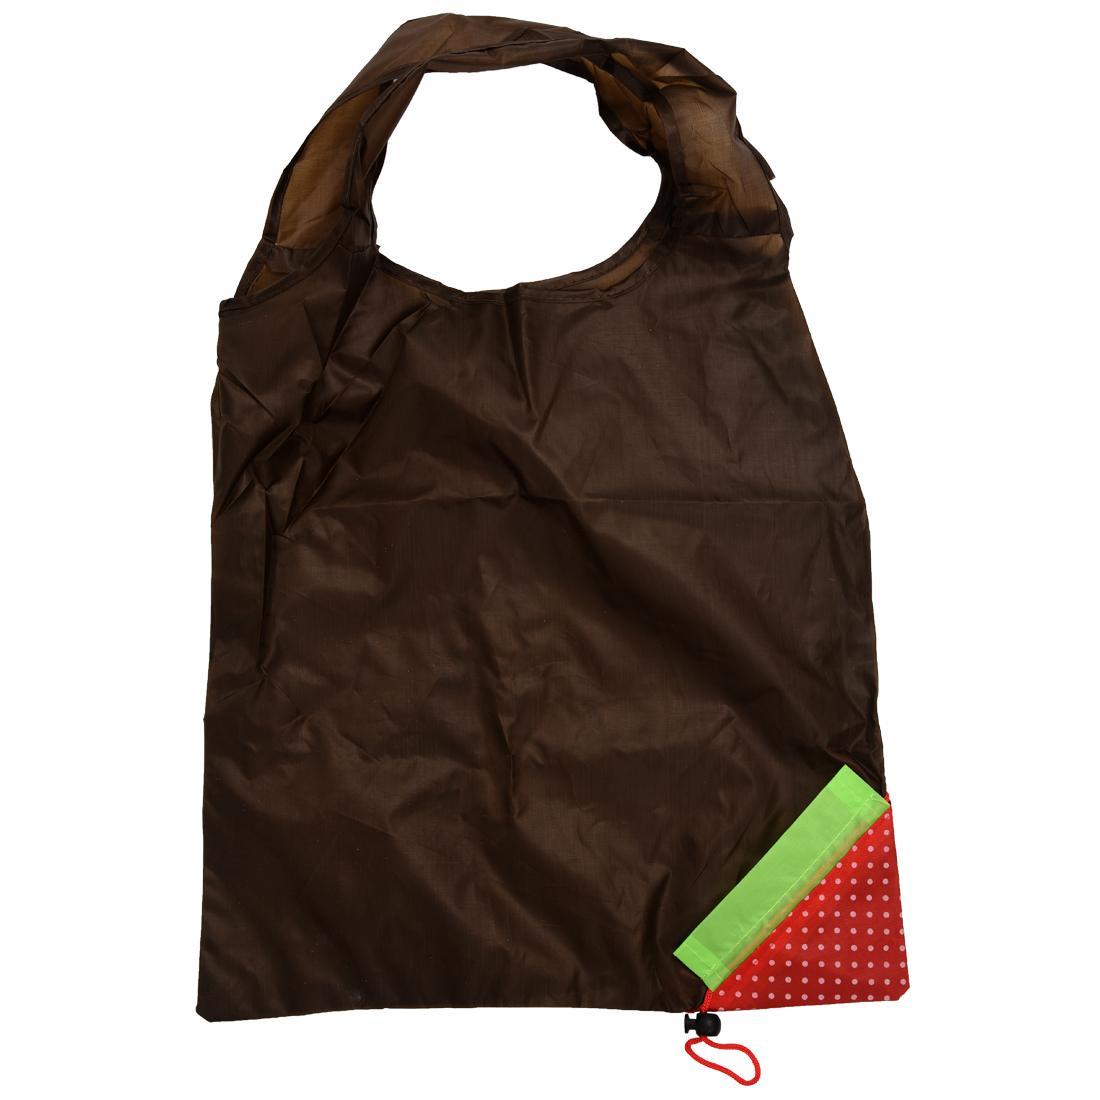 Unique Strawberry Folding Reusable Compact Eco Shopping Bag Nylon